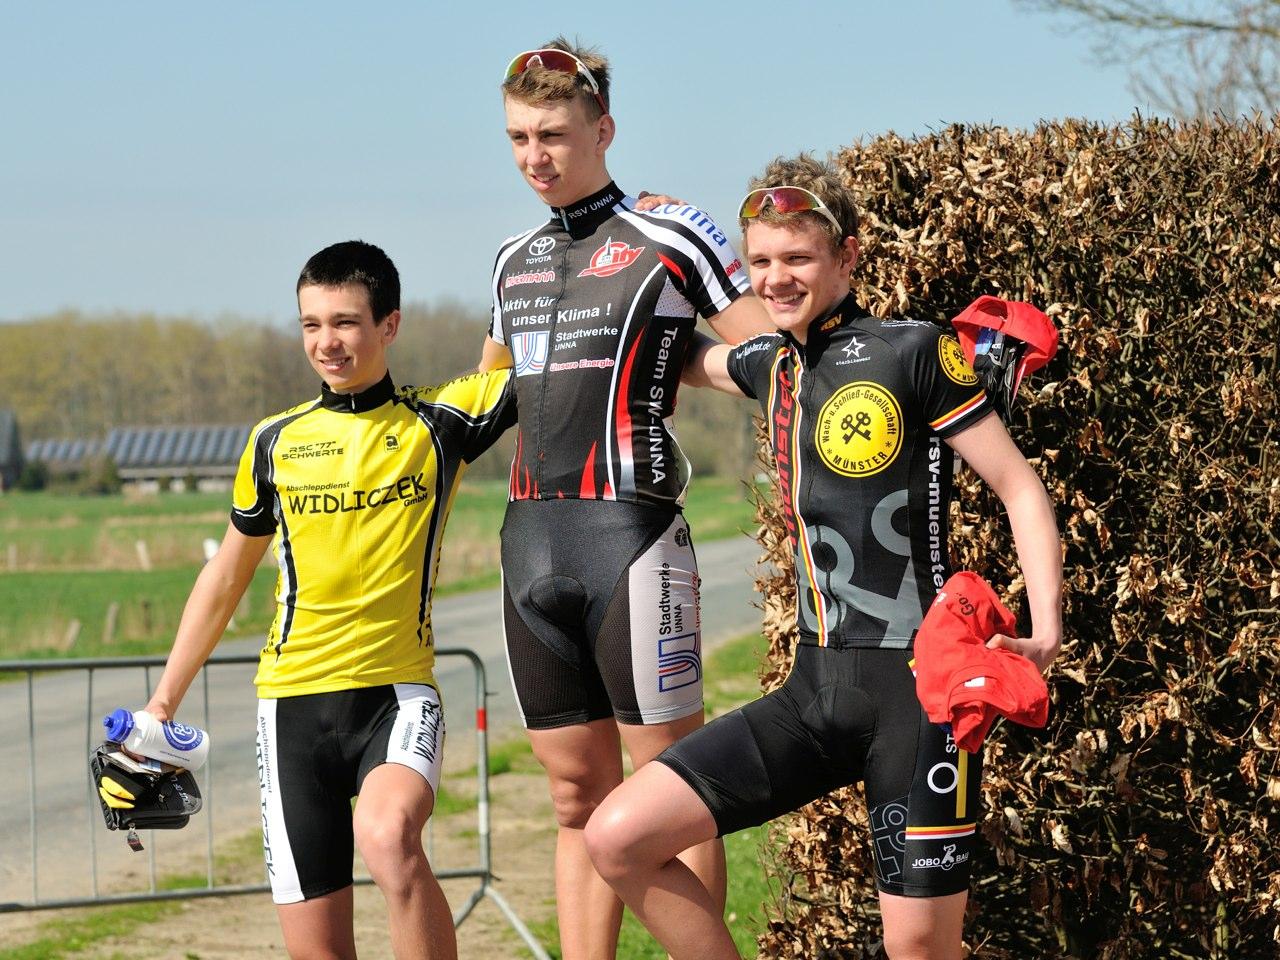 2. Platz für Robin Bölk in Melle-Gesmold (21.04.13)